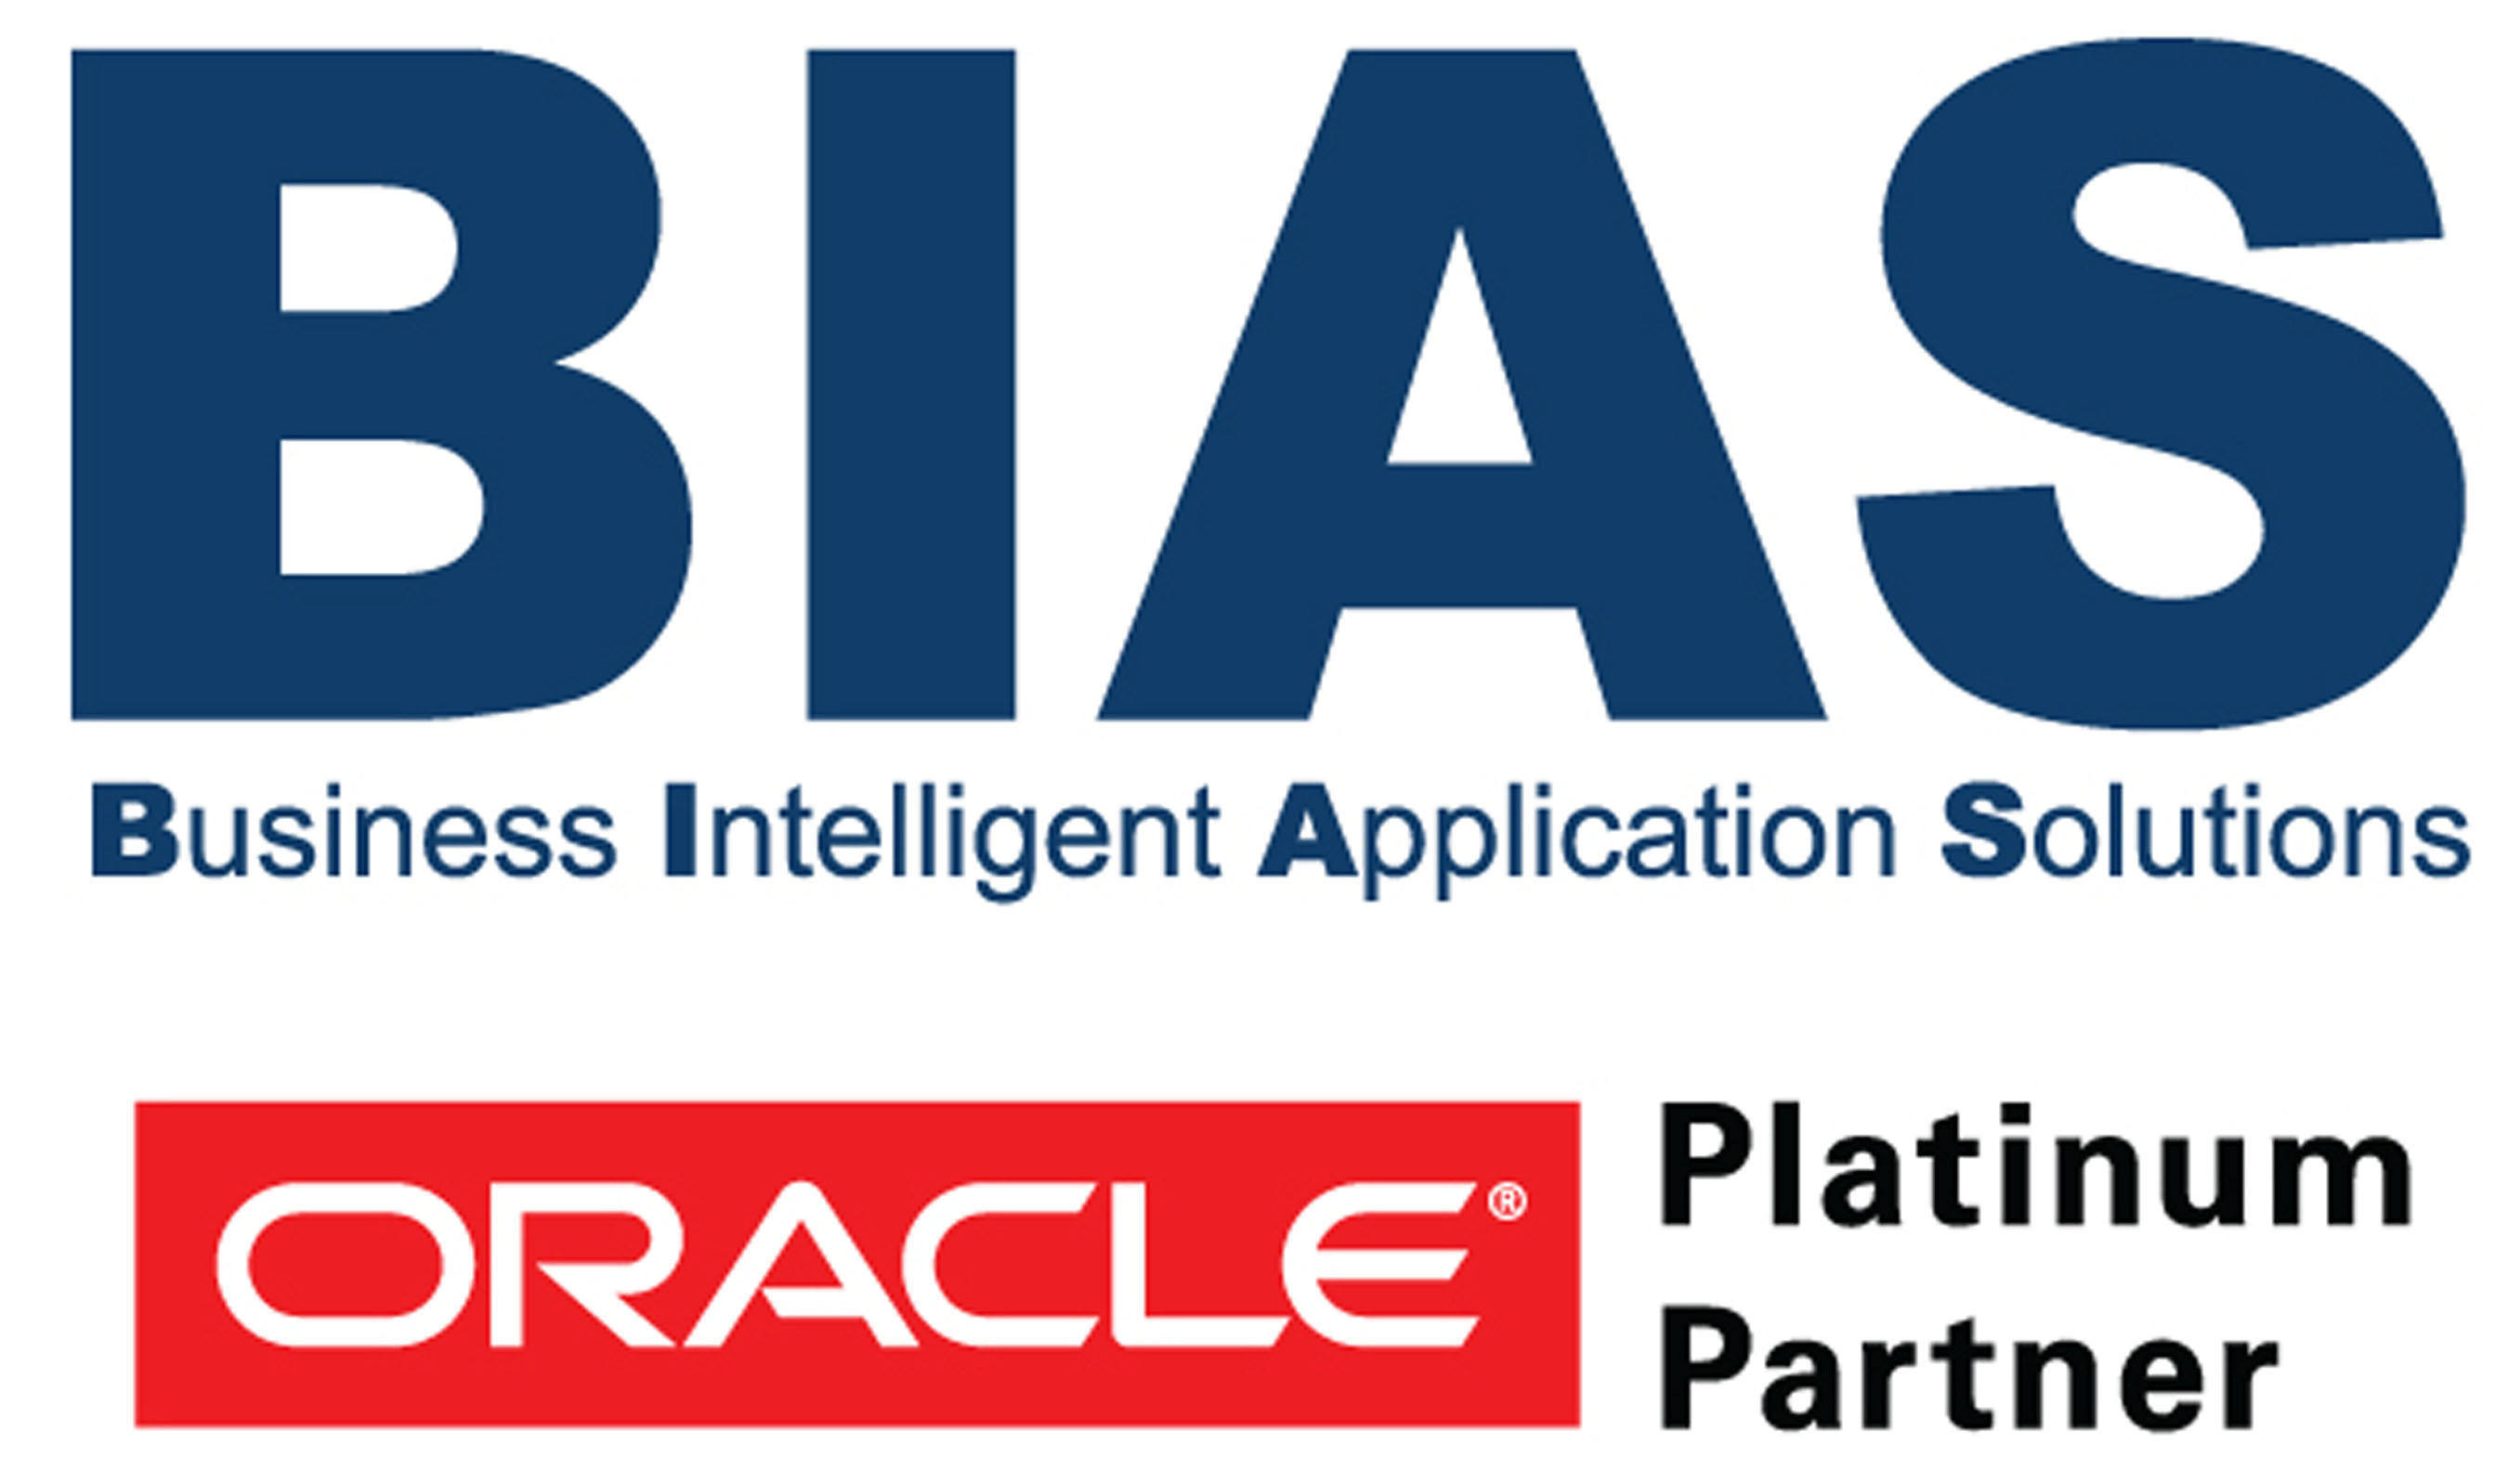 Bias Corporation Completes Soc 2 Certification Reaffirming